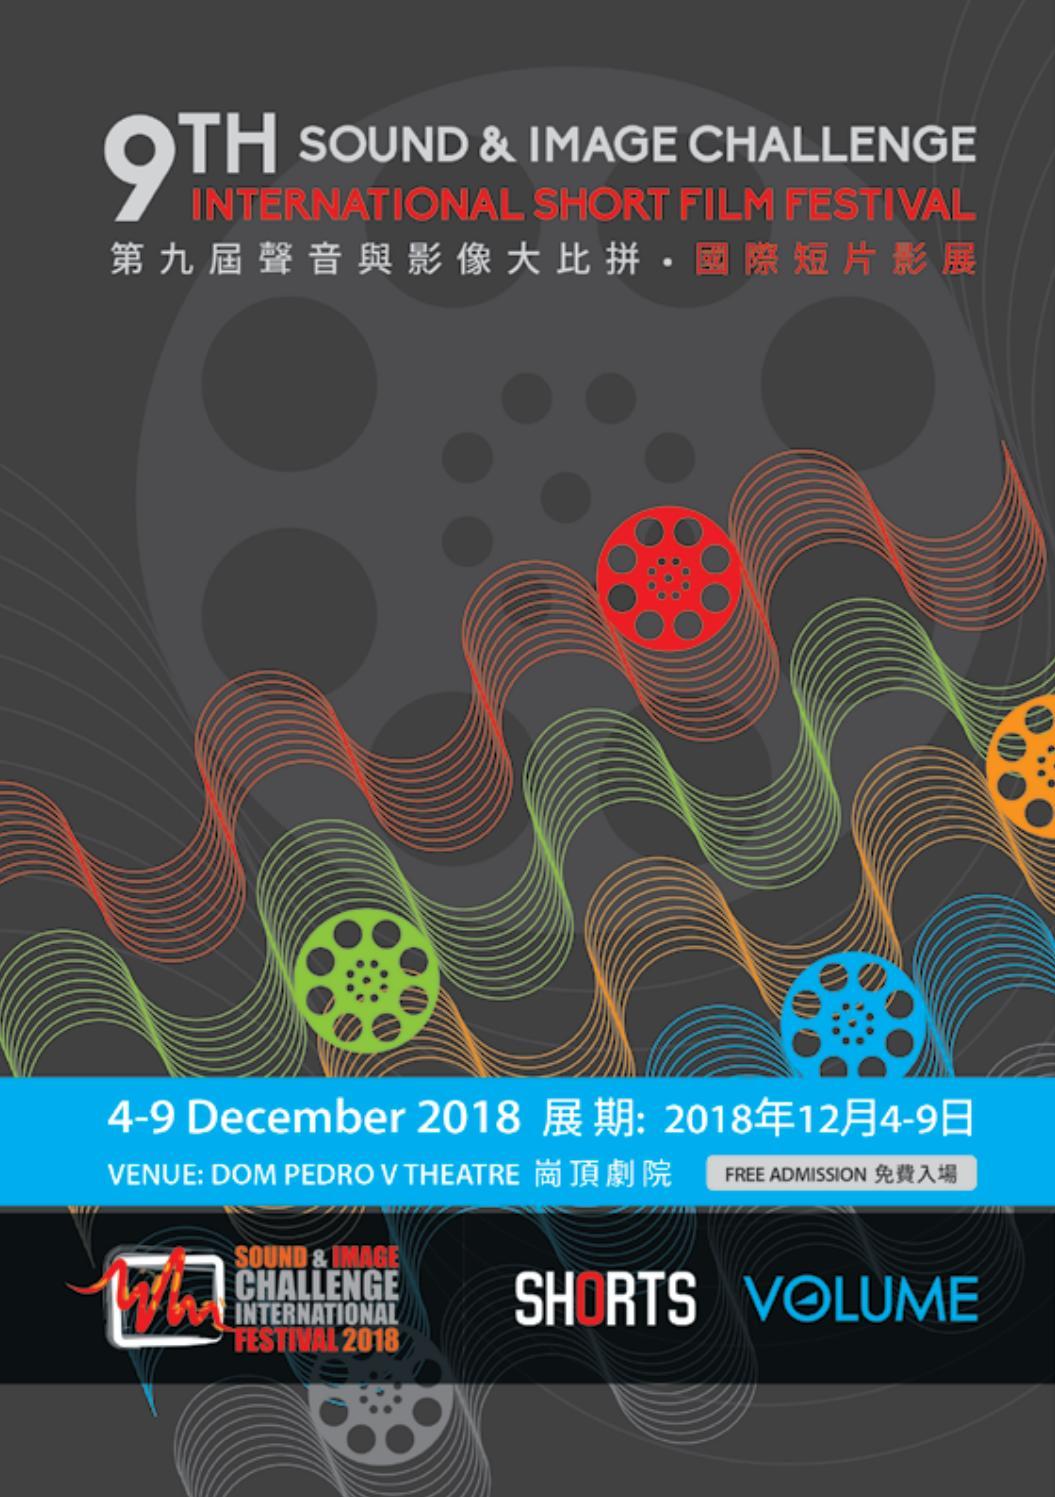 399bc5228 Sound & Image Challenge International Festival 2018 by Sound & Image  Challenge International Festival - issuu